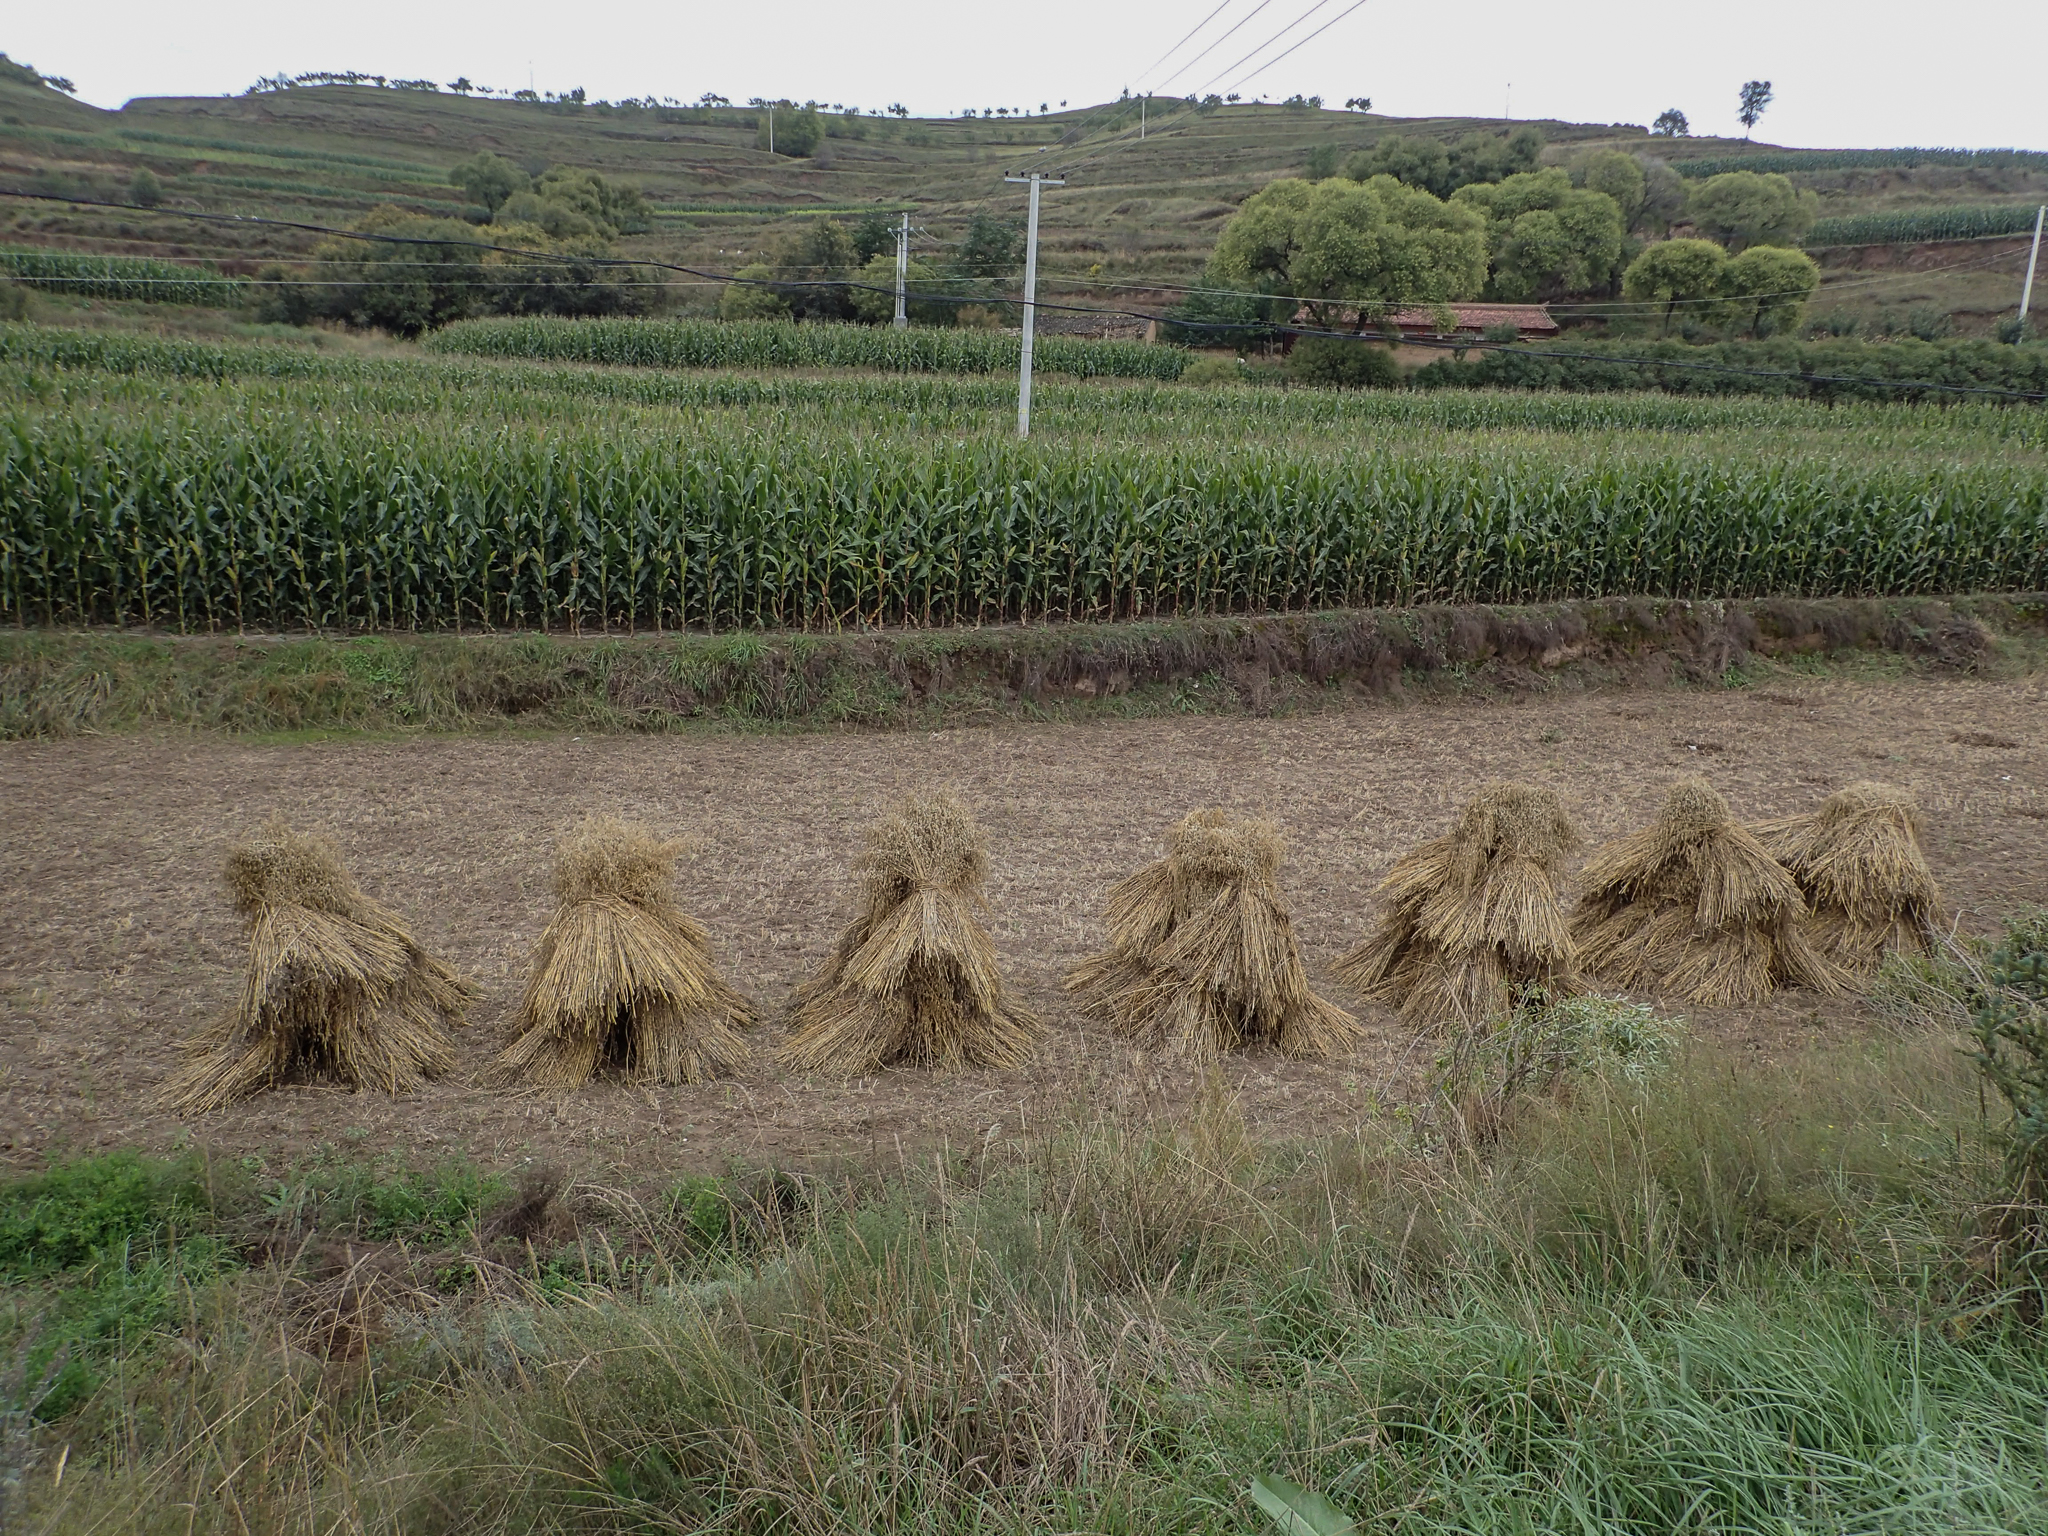 Traditional corn stacks